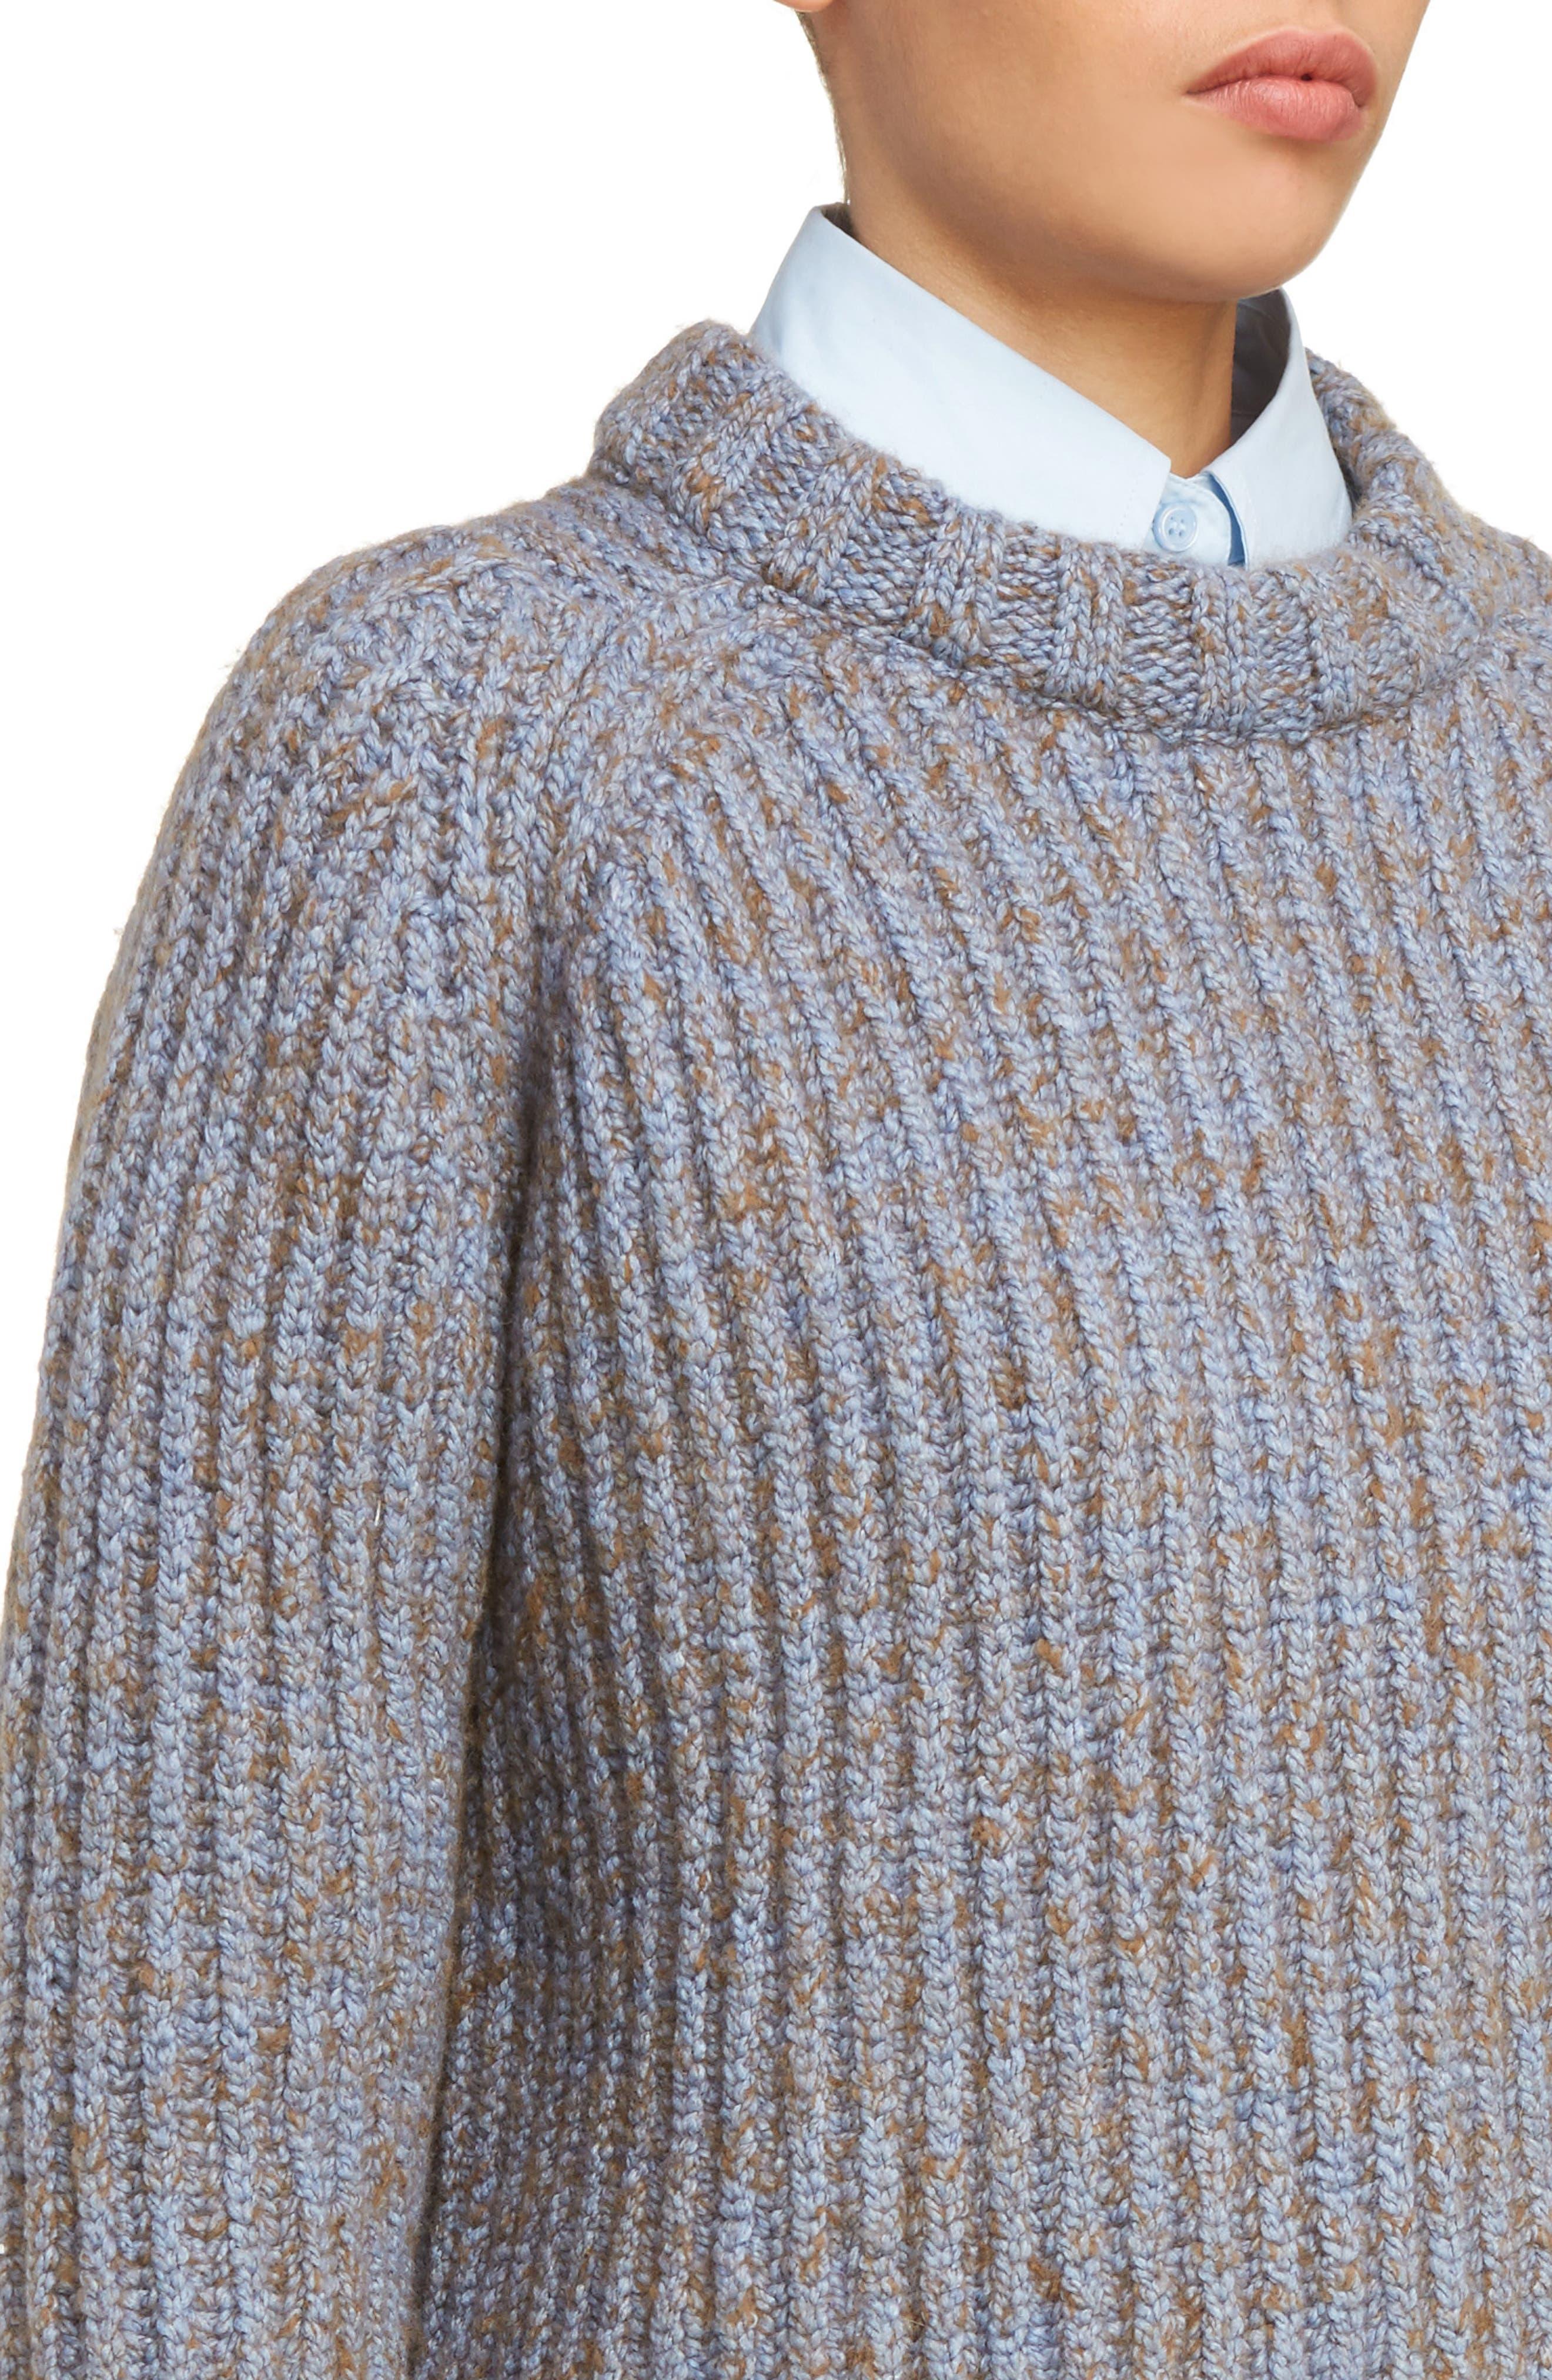 Sandy Mouline Cable Knit Sweater,                             Alternate thumbnail 4, color,                             400